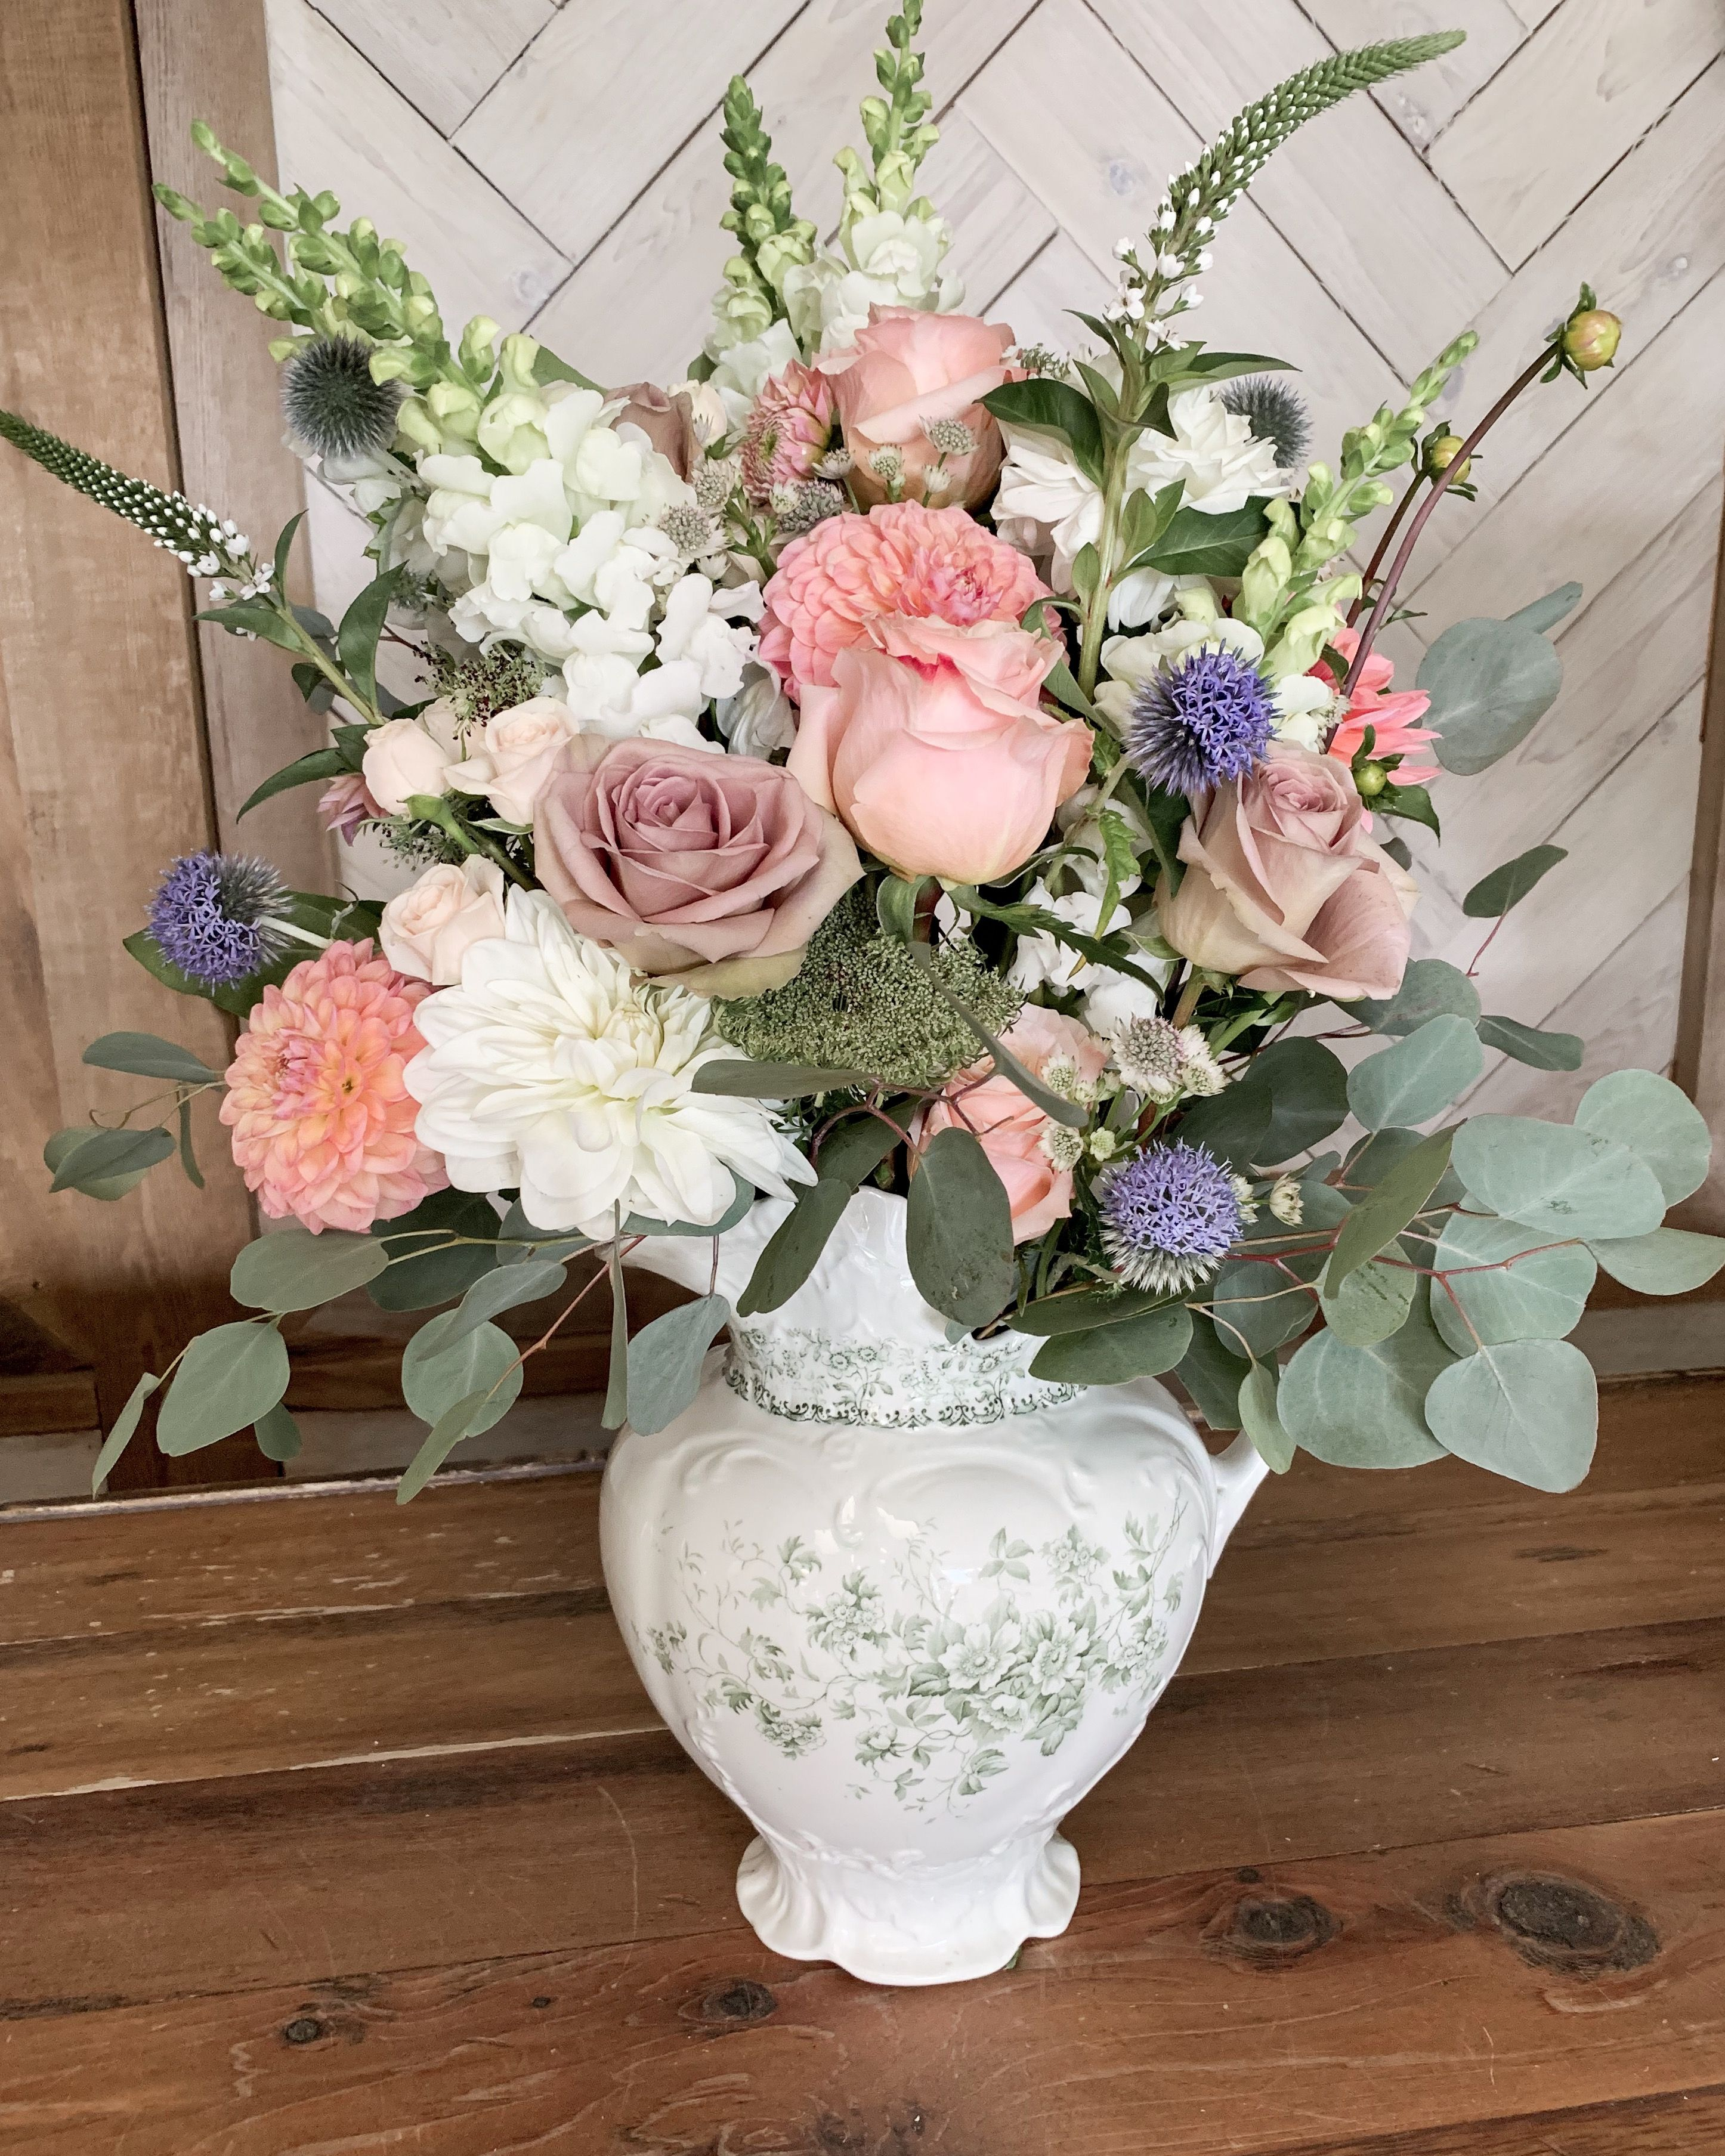 Antique vase flower arrangement flower vase arrangements